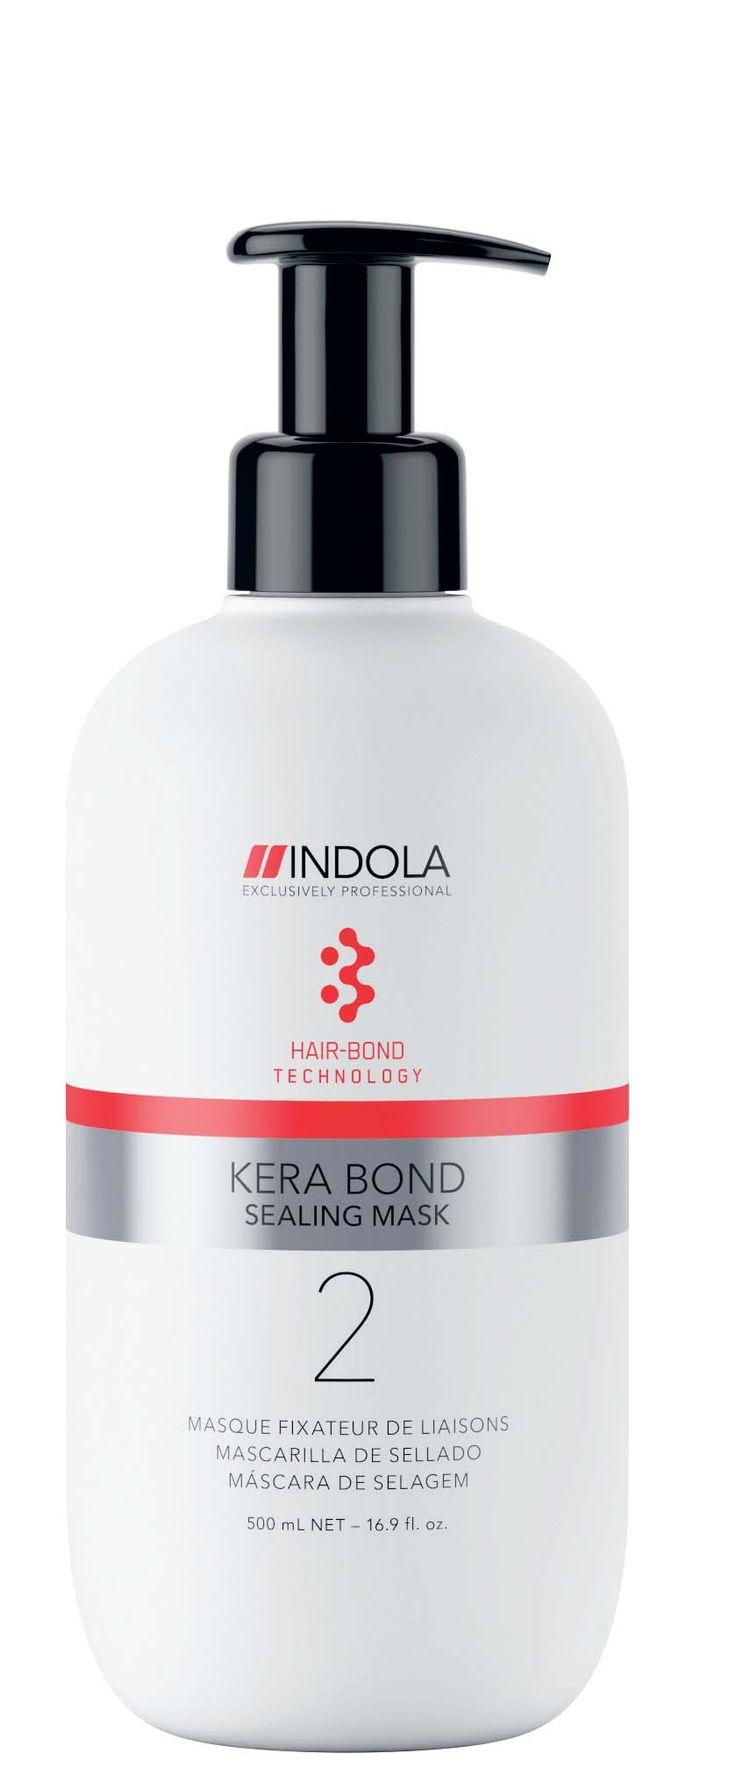 Indola Kera Bond Bond Sealing Mask 500ml.